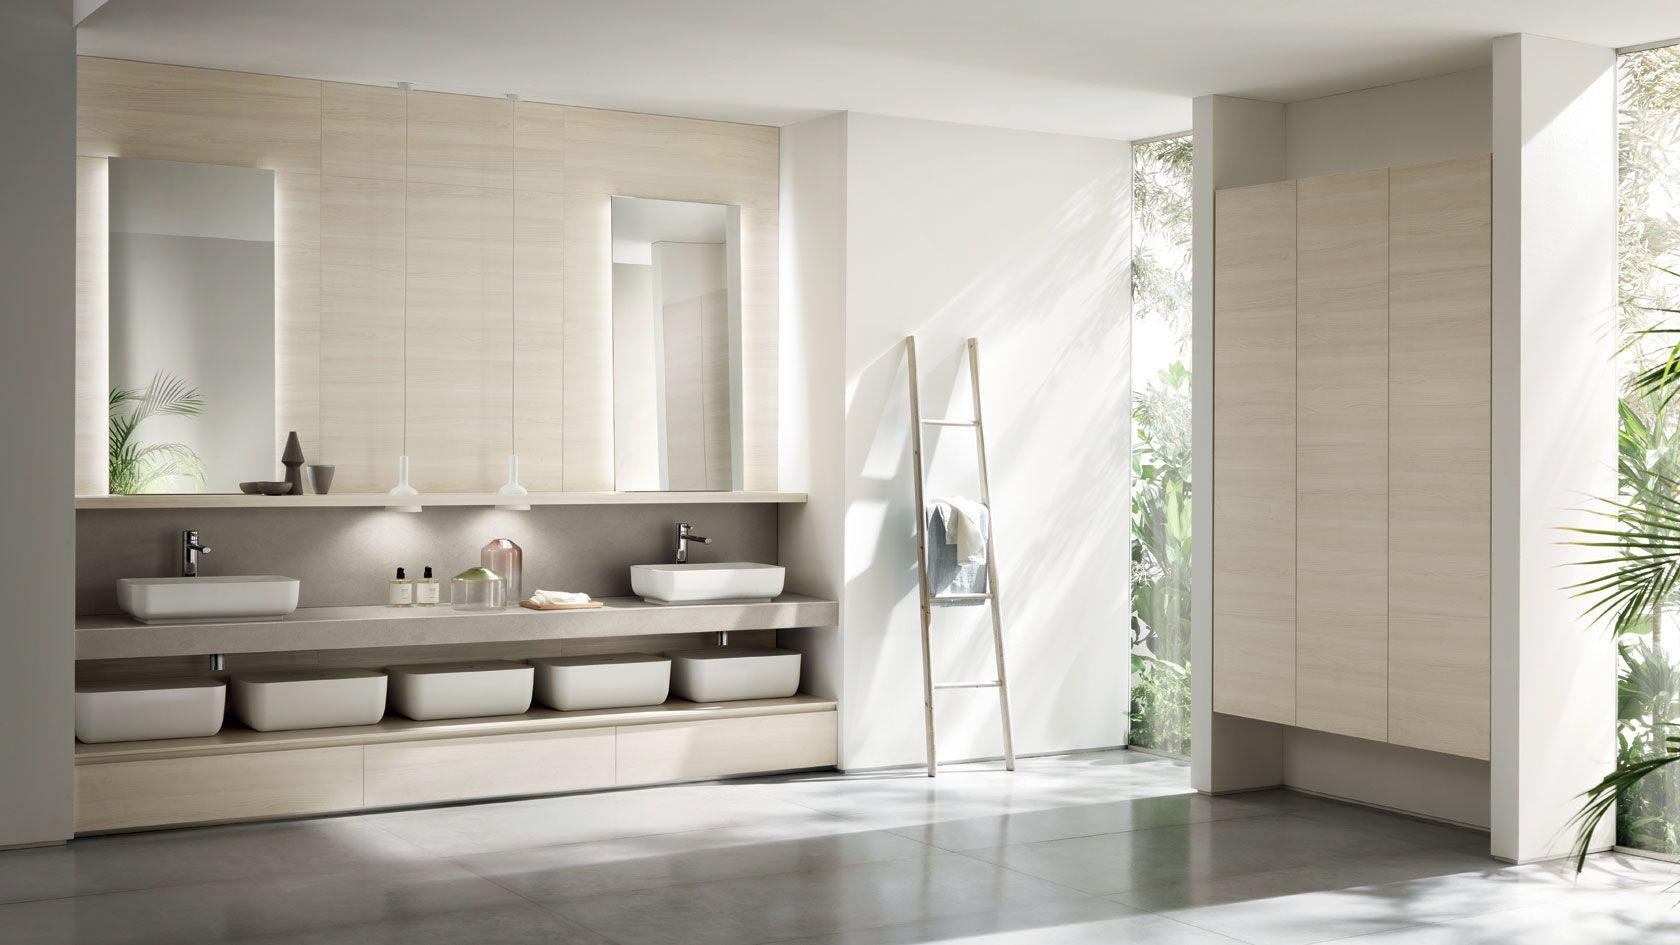 Ki Bathroom design by Nendo. The bathroom are